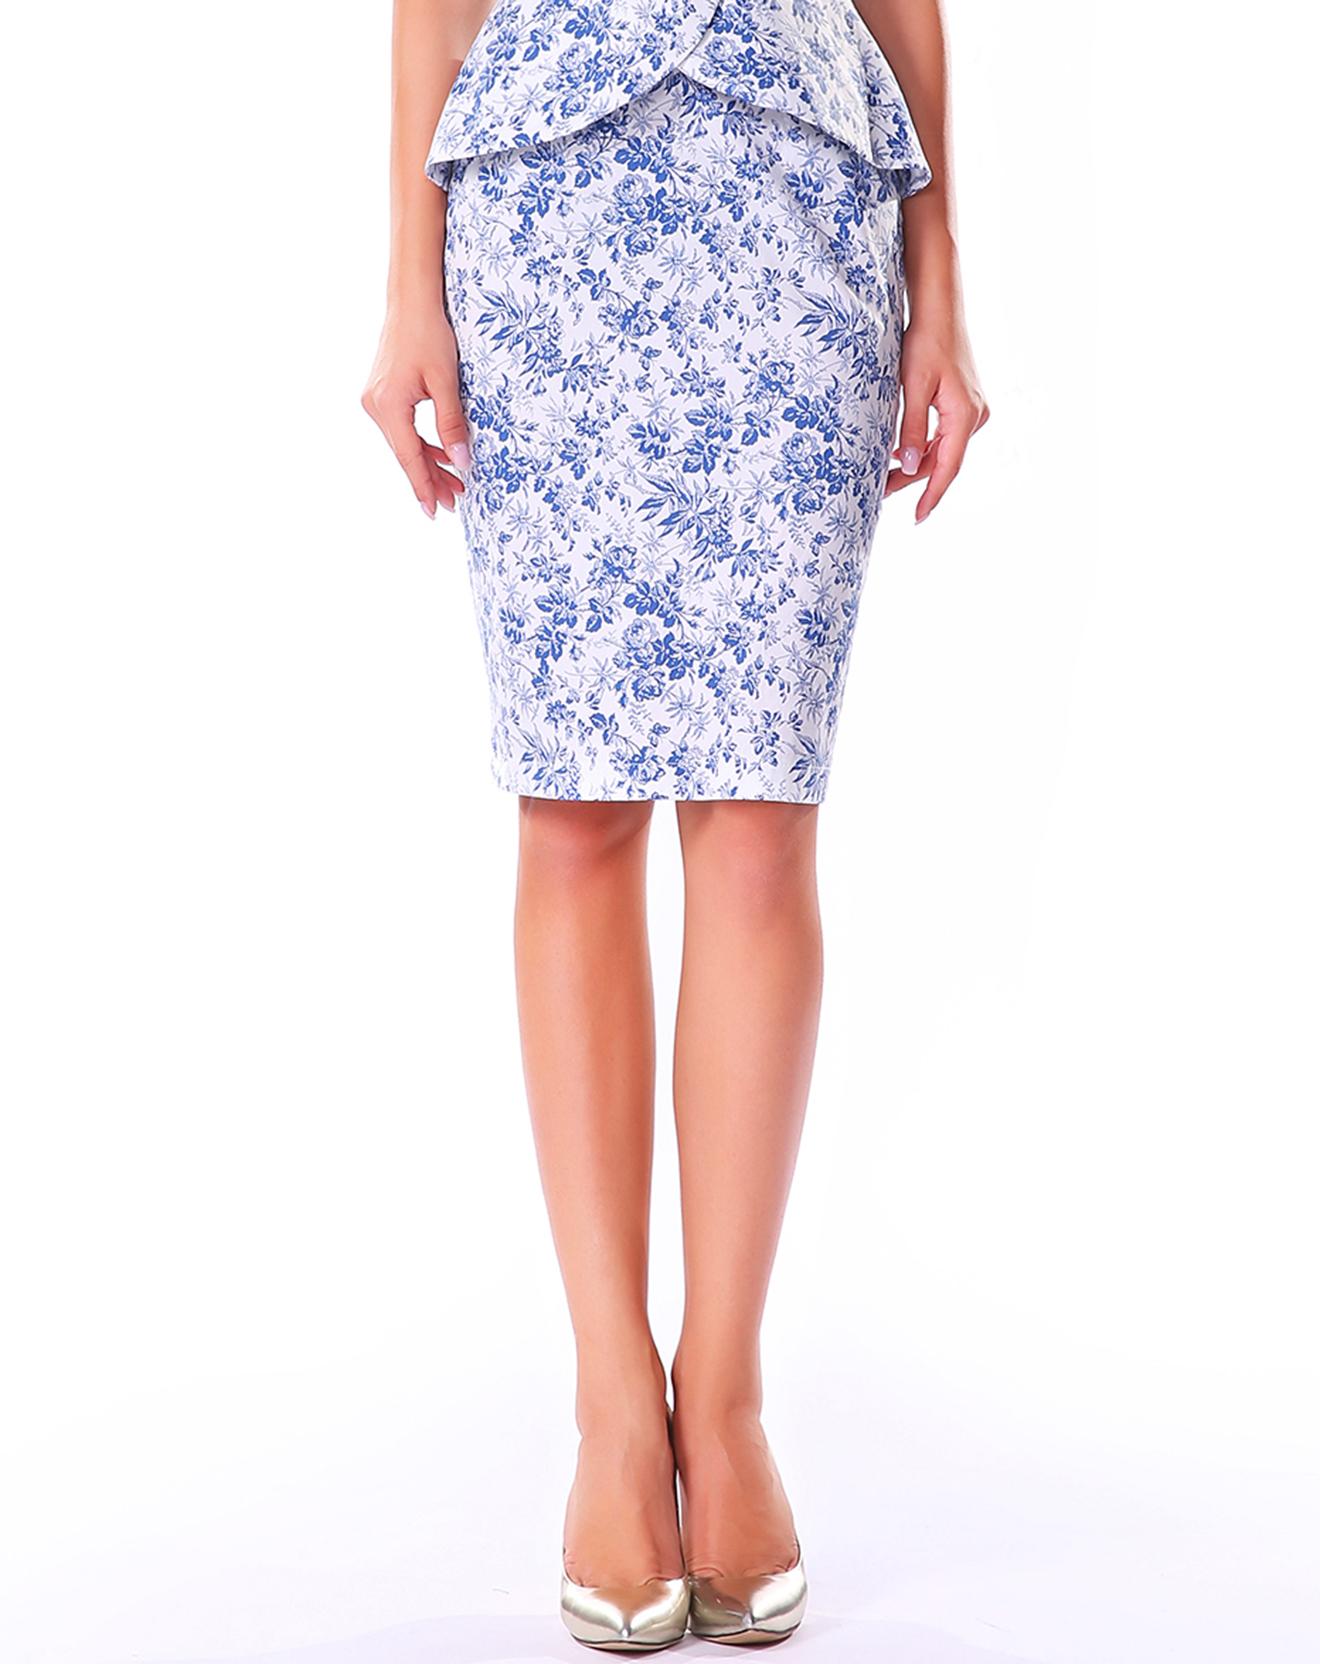 Jupe fourreau bleu floral - Isabel garcia - Modalova